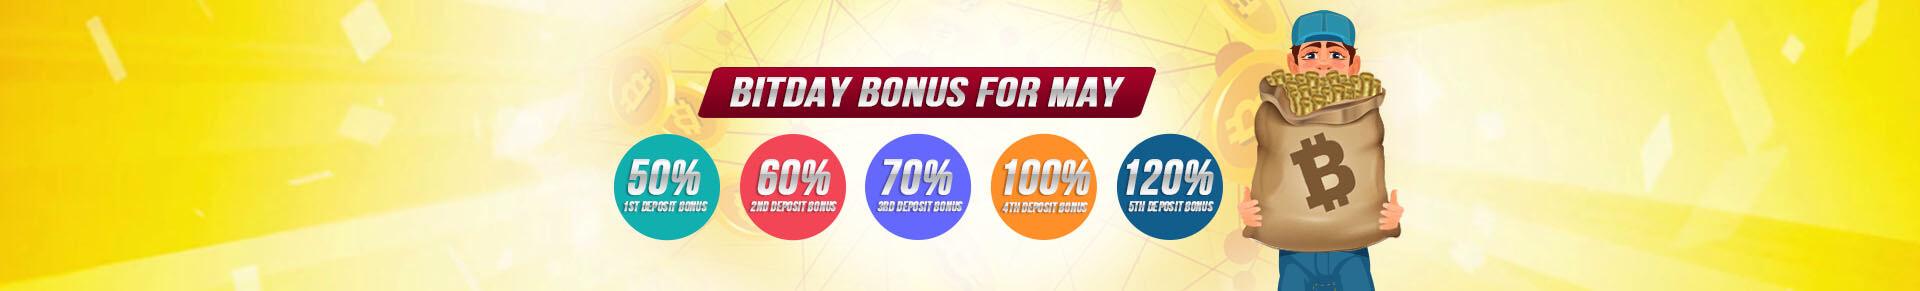 May BitDay Bonus